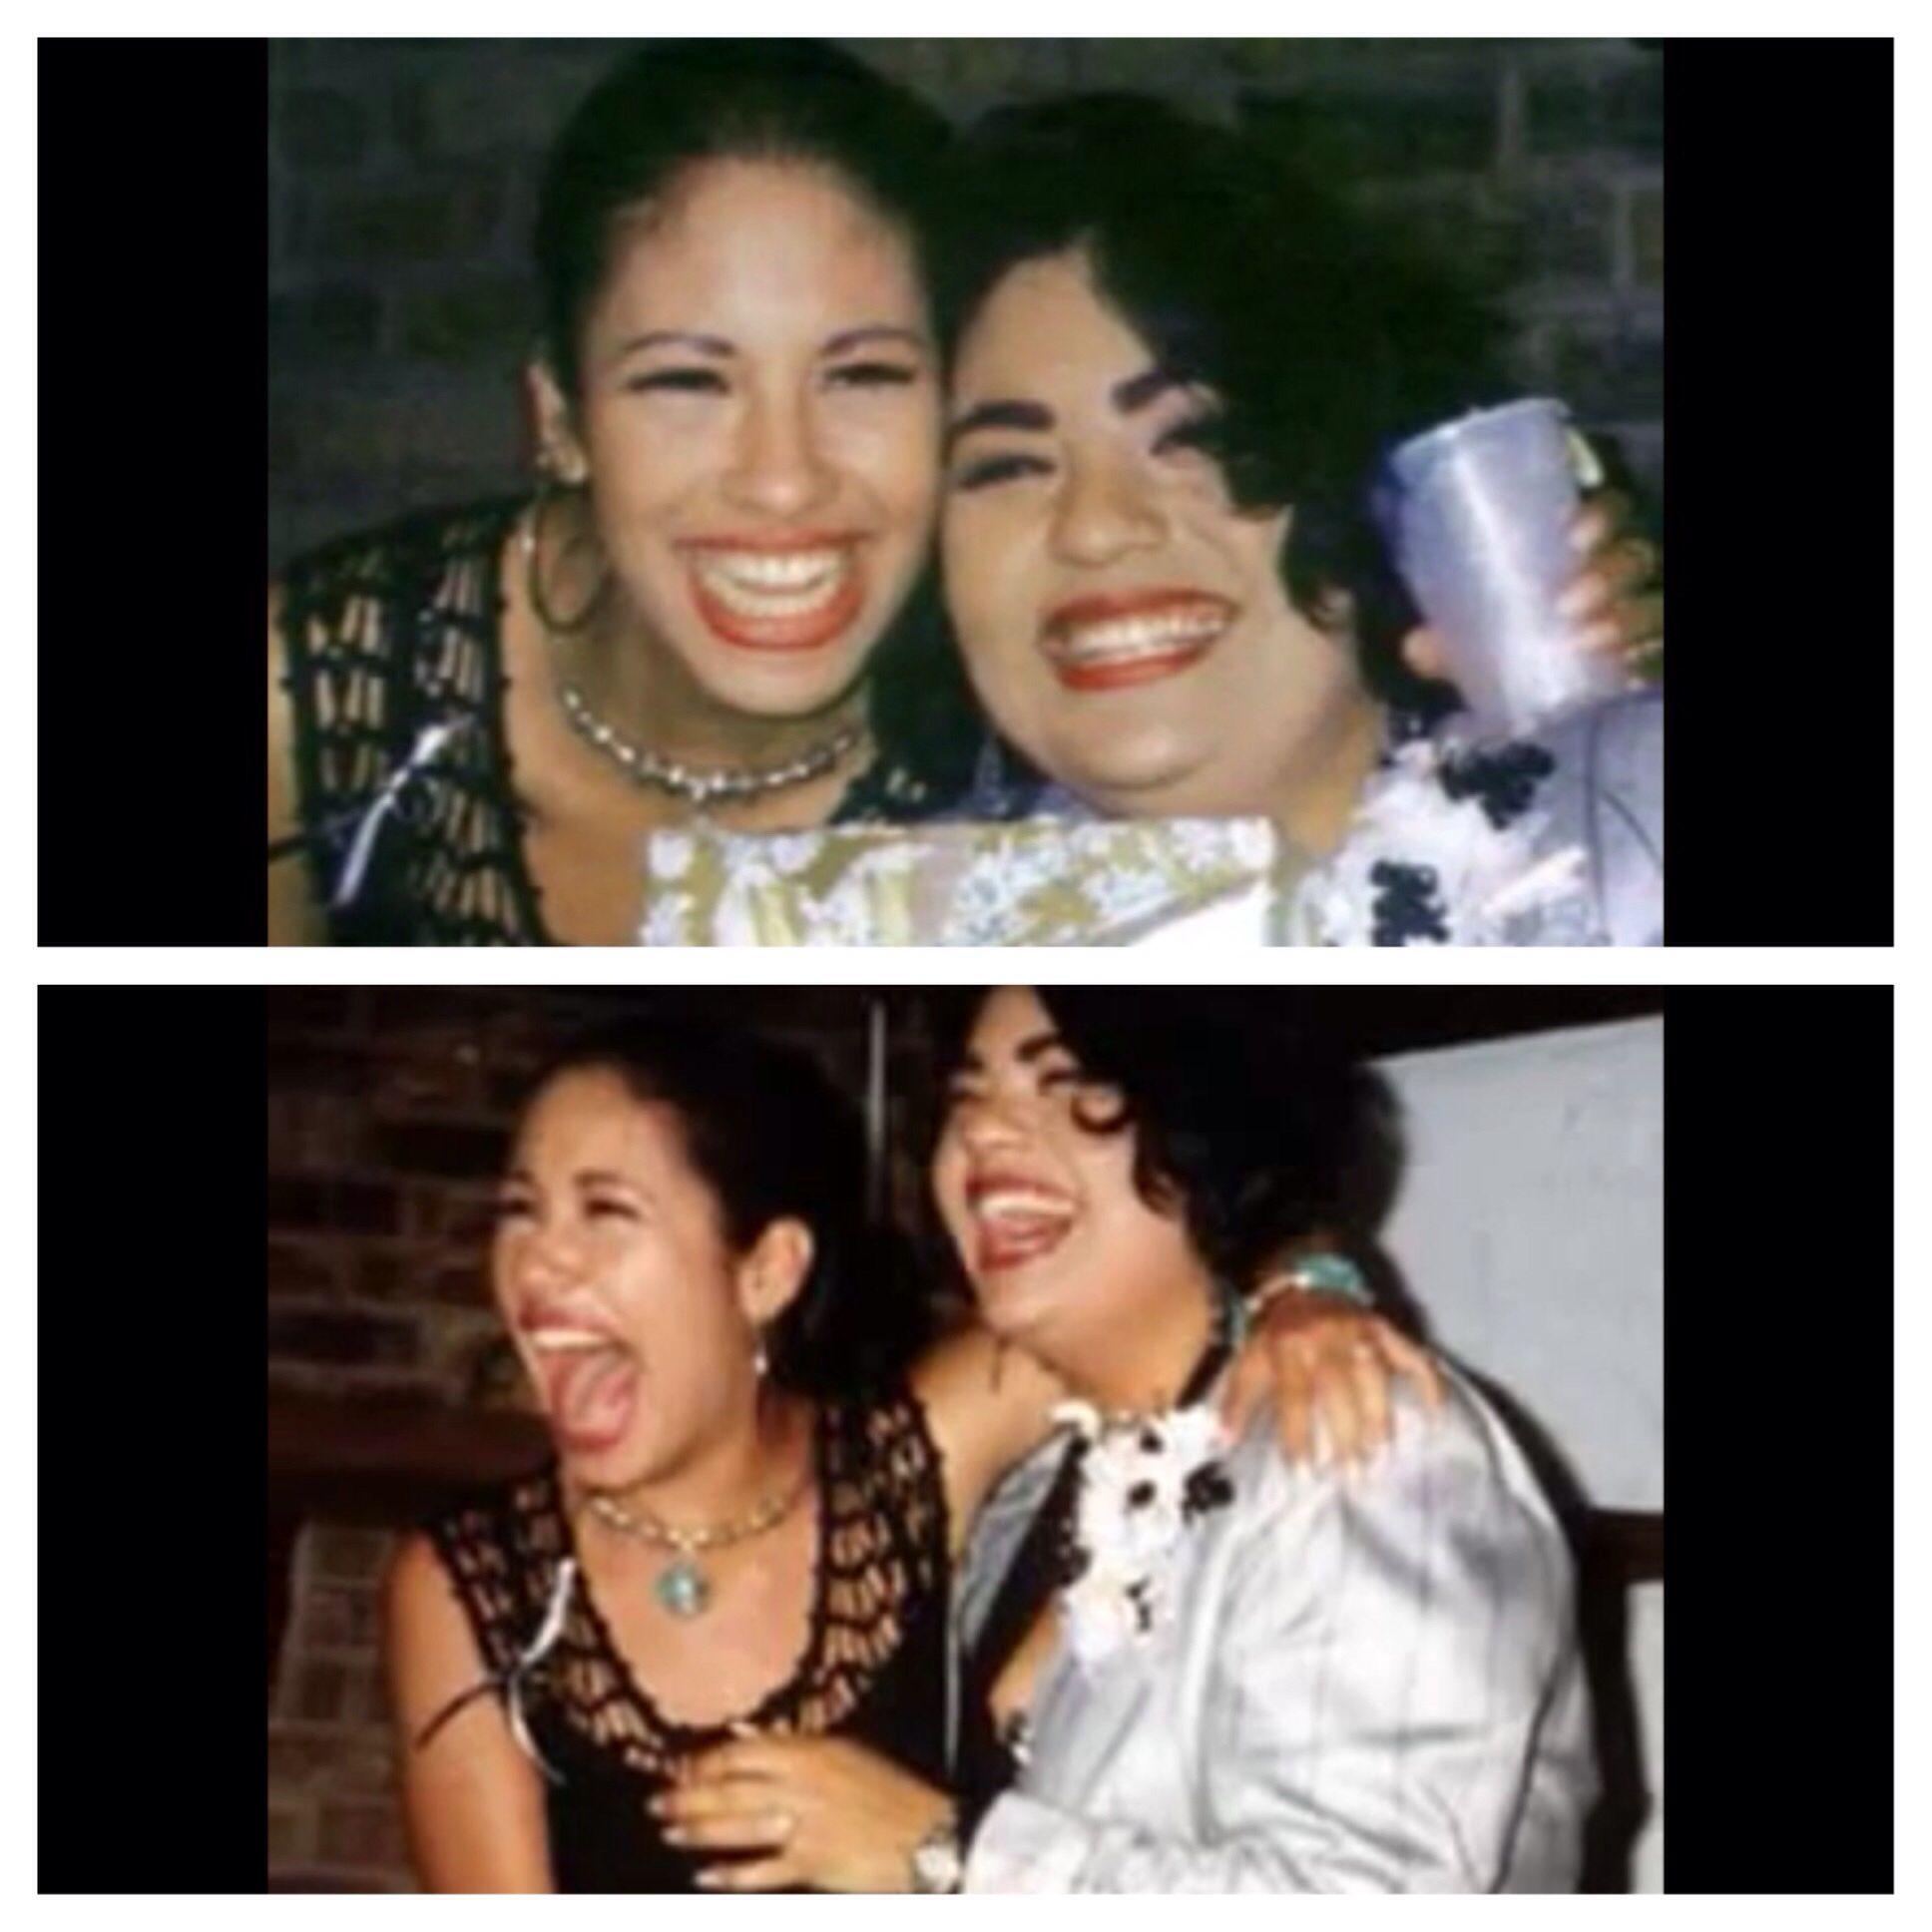 Selena and Suzette | Selena quintanilla, Selena quintanilla perez, Selena  quintanilla family